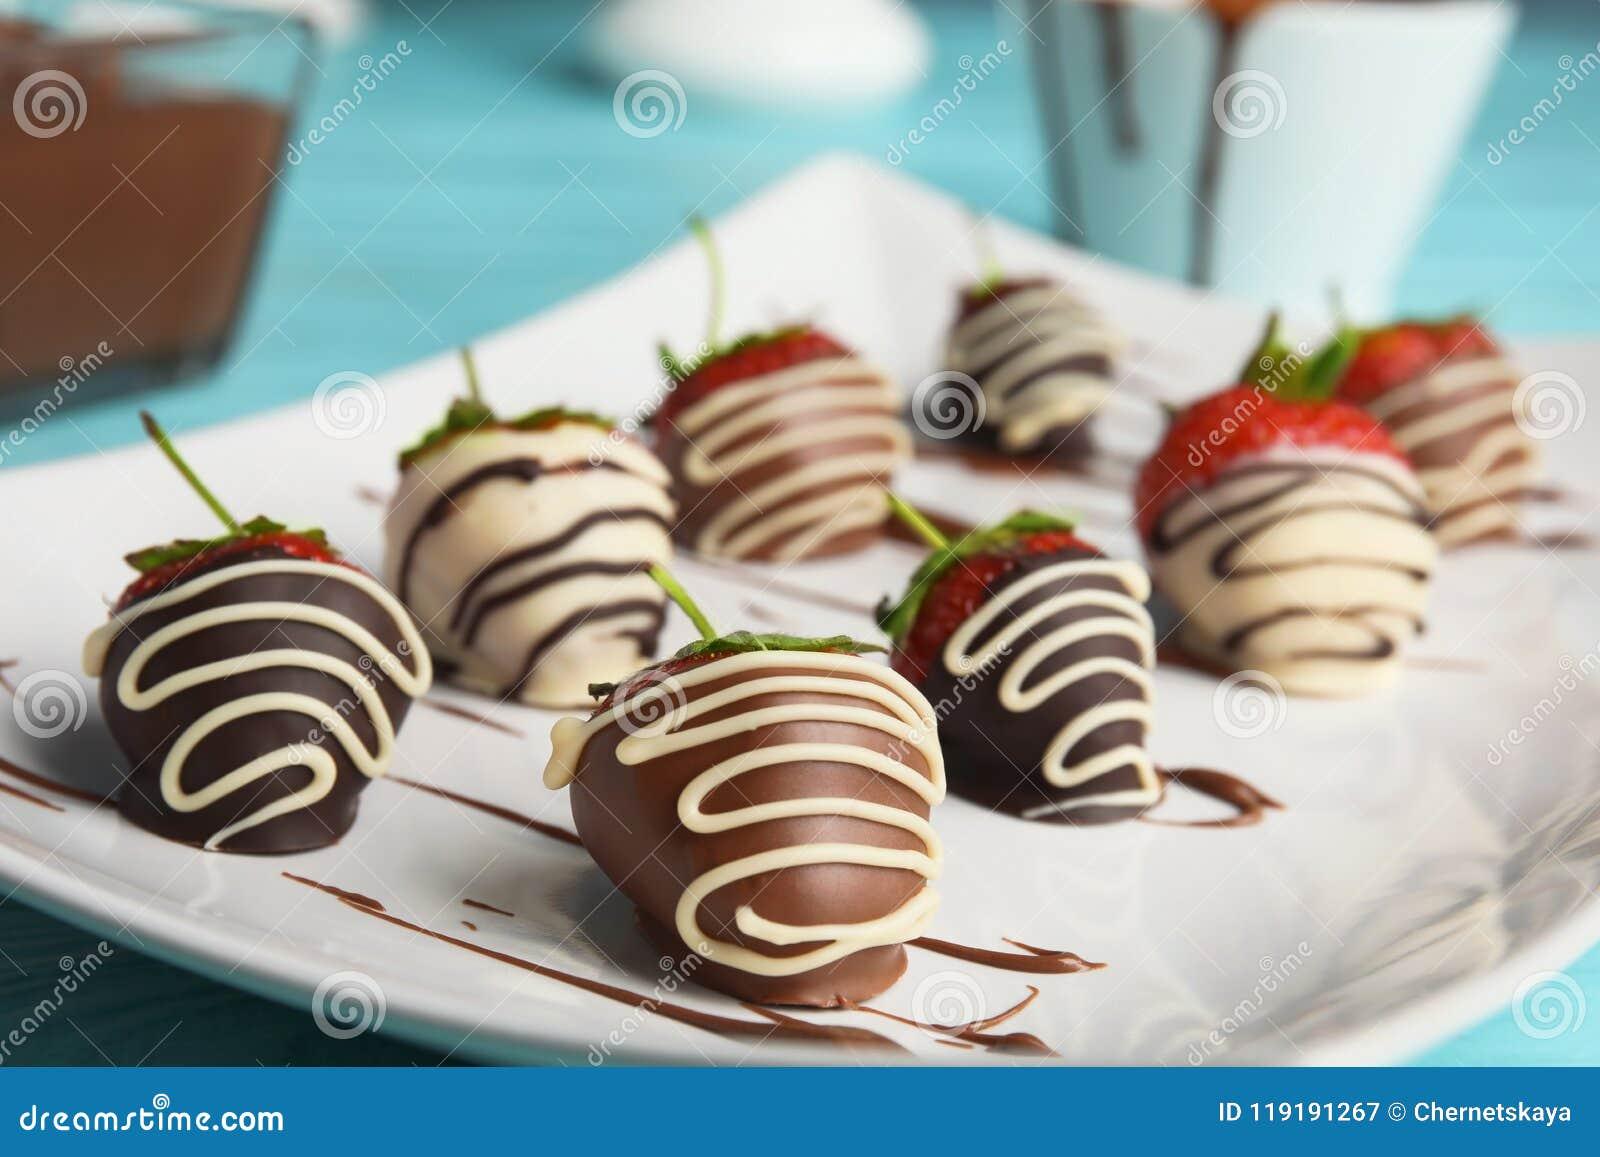 Platte mit Schokolade bedeckte Erdbeeren